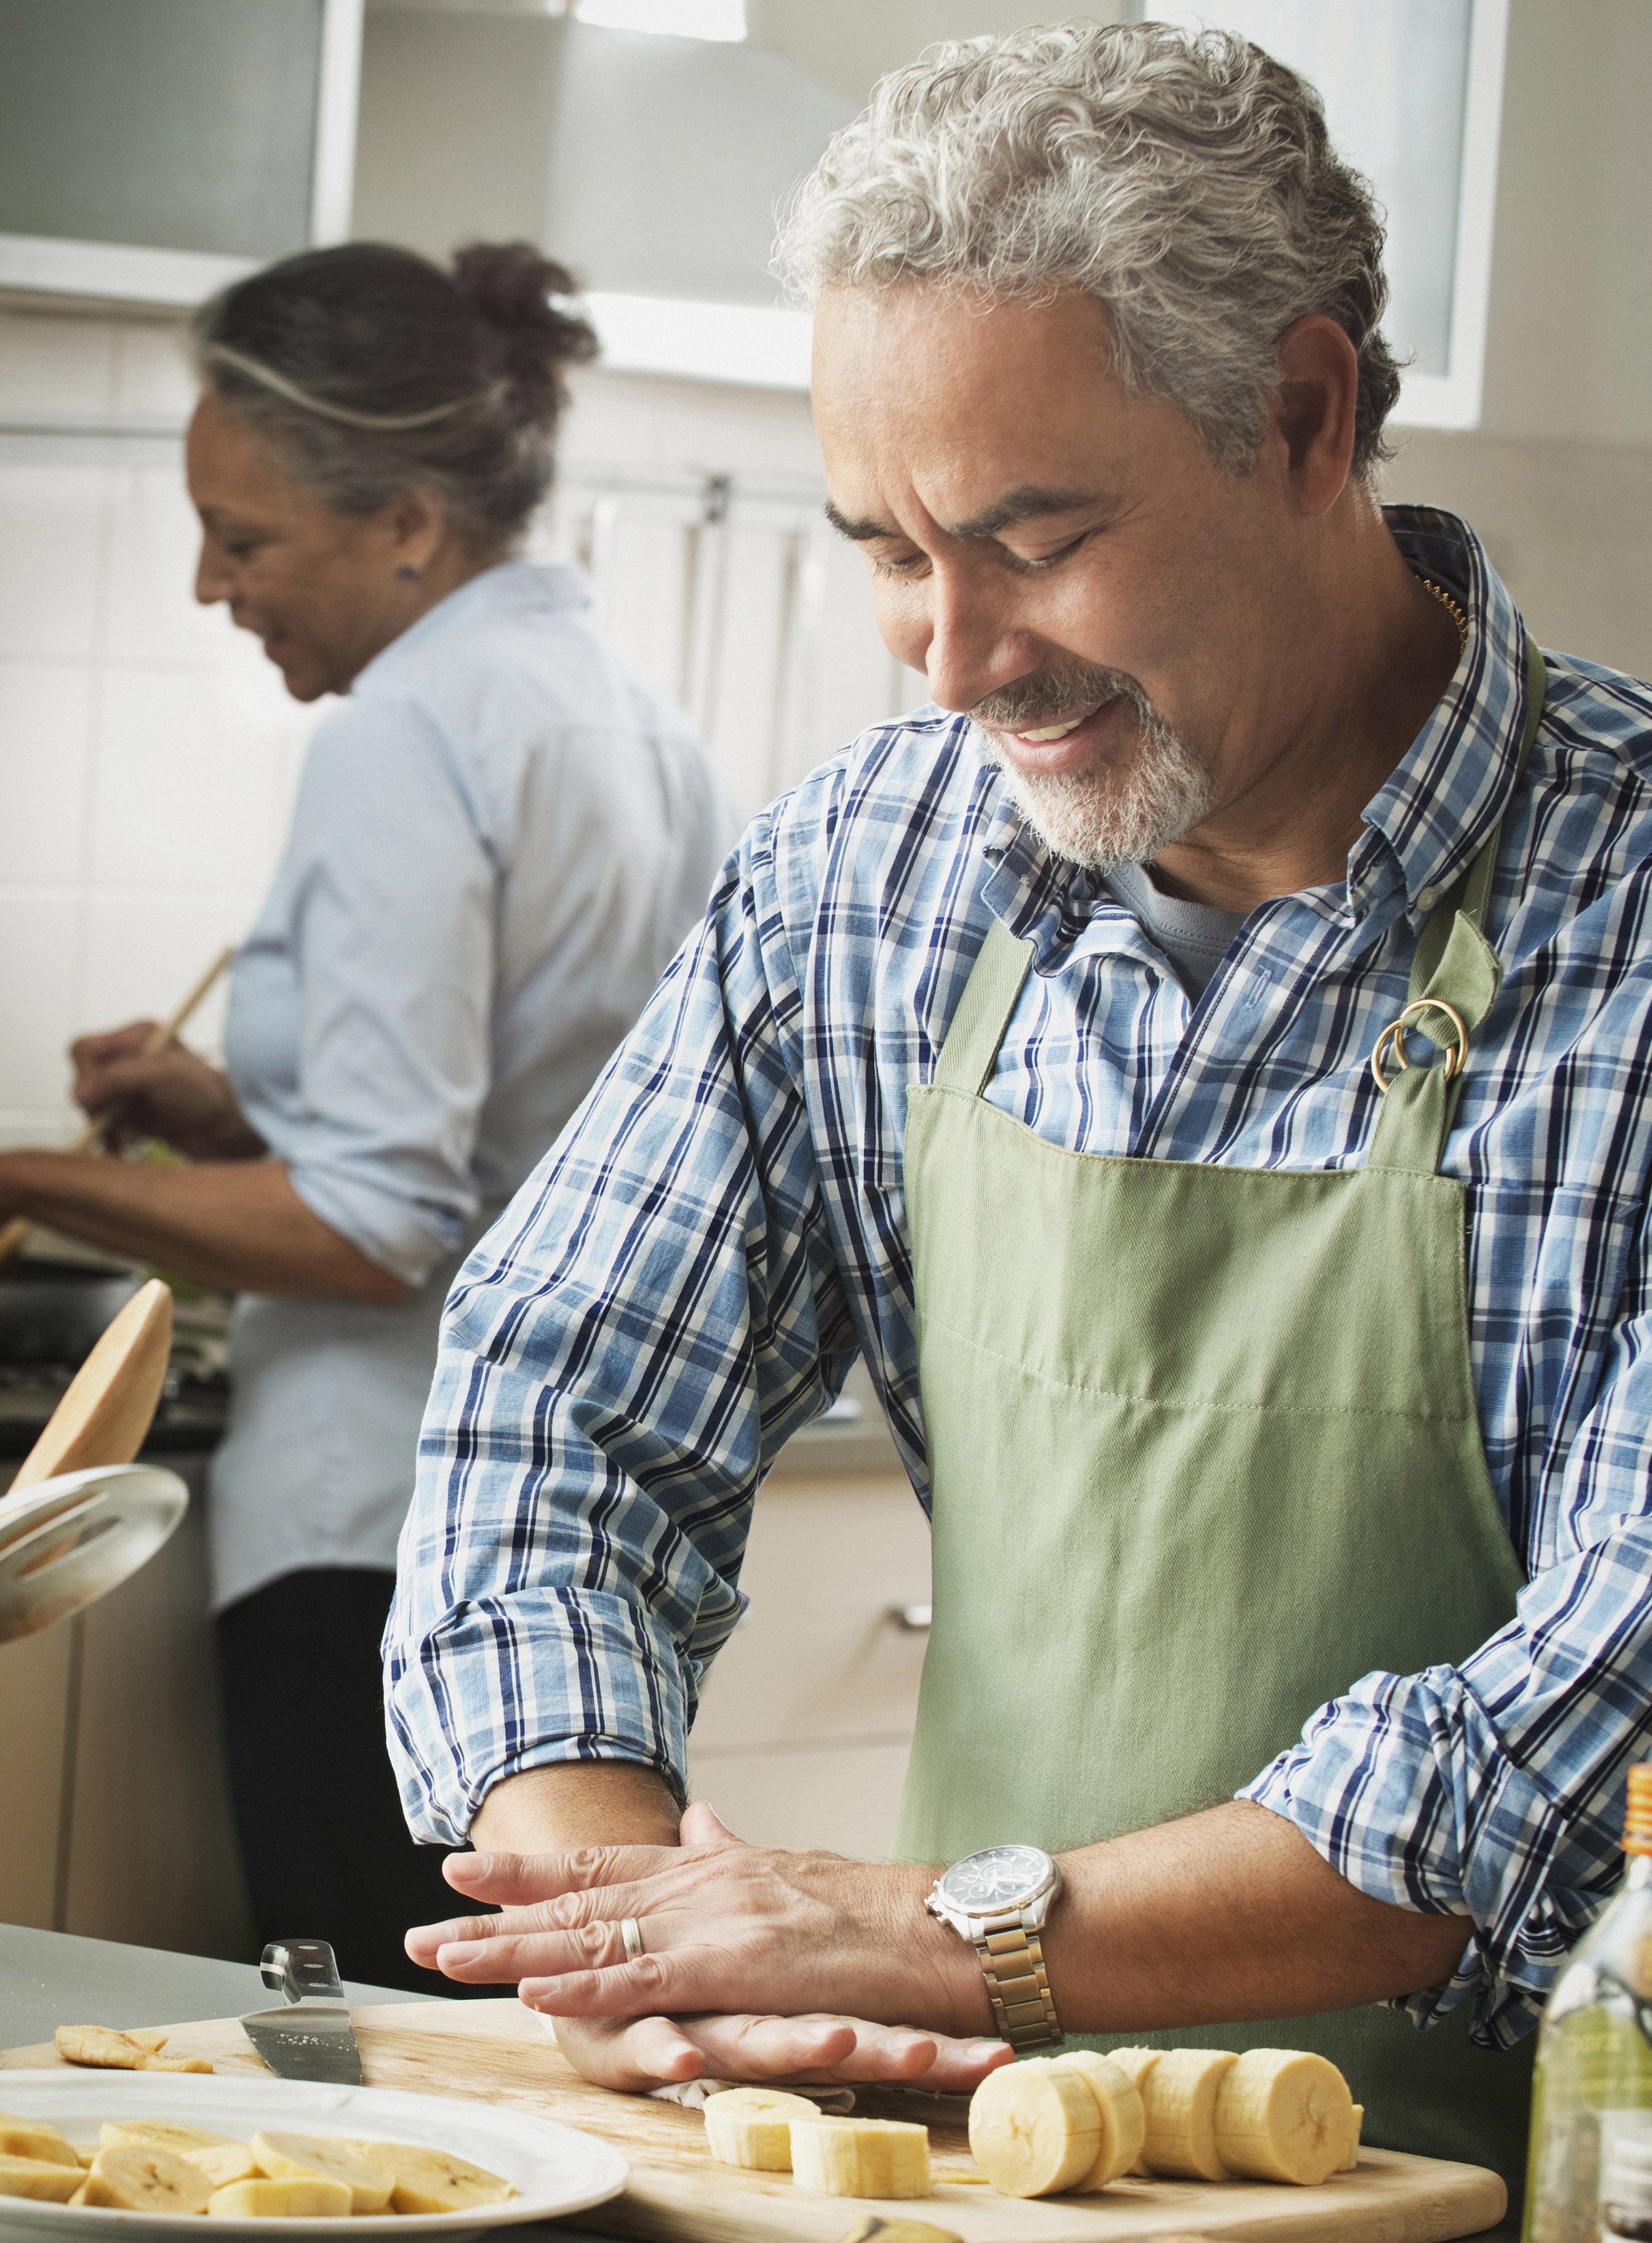 crop 619-08217113_cooking_family_senior_diverse